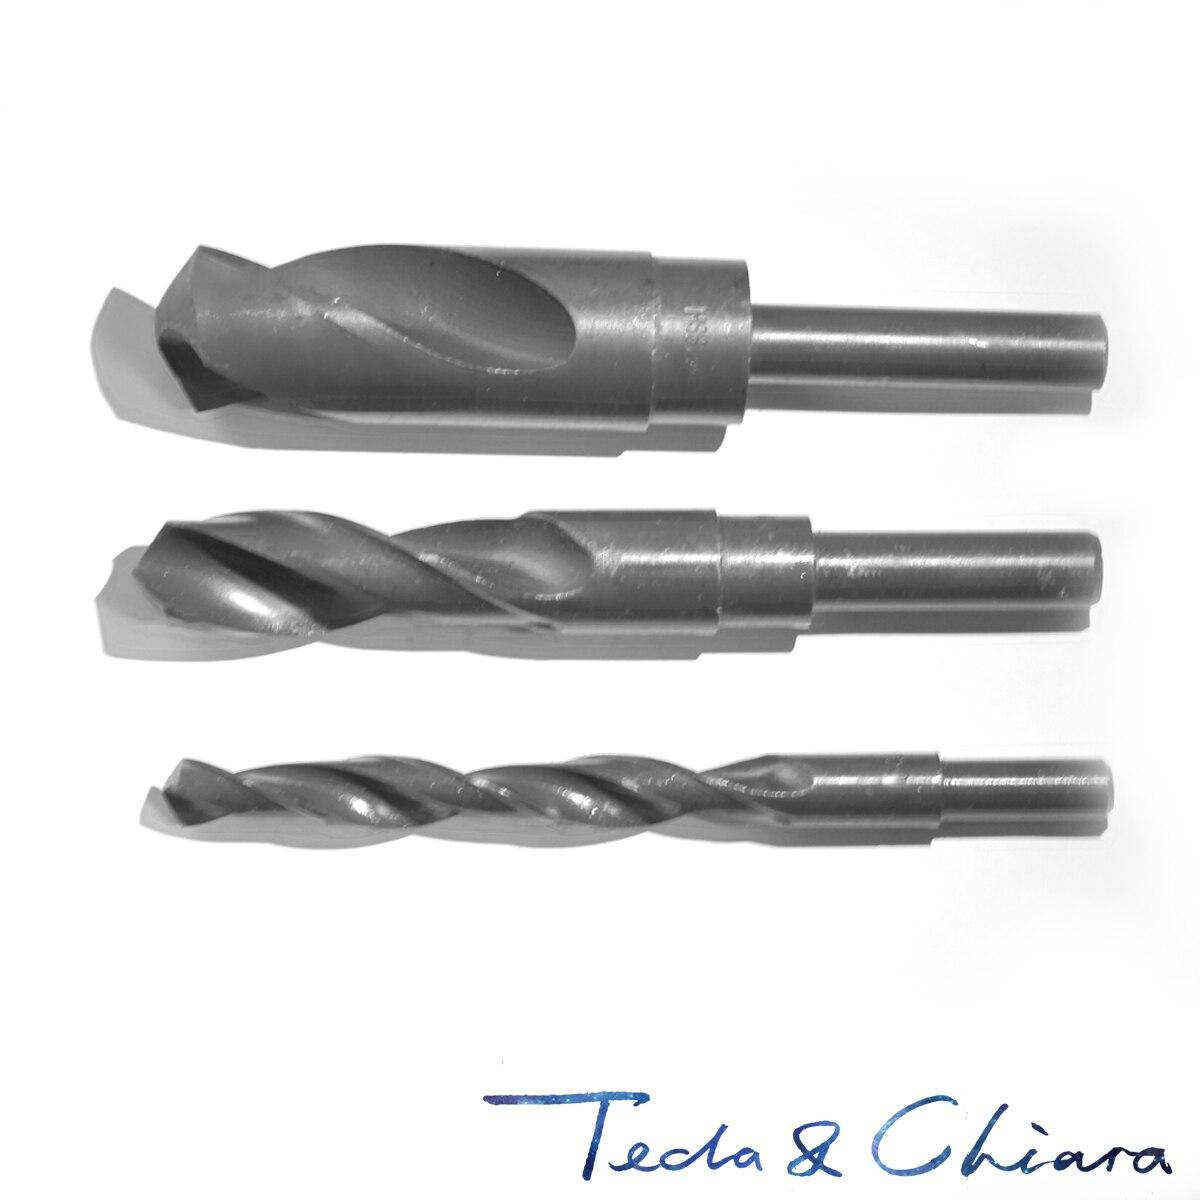 13,1mm 13,2mm 13,3mm 13,4mm 13,5mm HSS reducido manivela recta giro broca diámetro 12,7mm 1/2 pulgadas 13,1 13,2 13,3 13,4 13,5